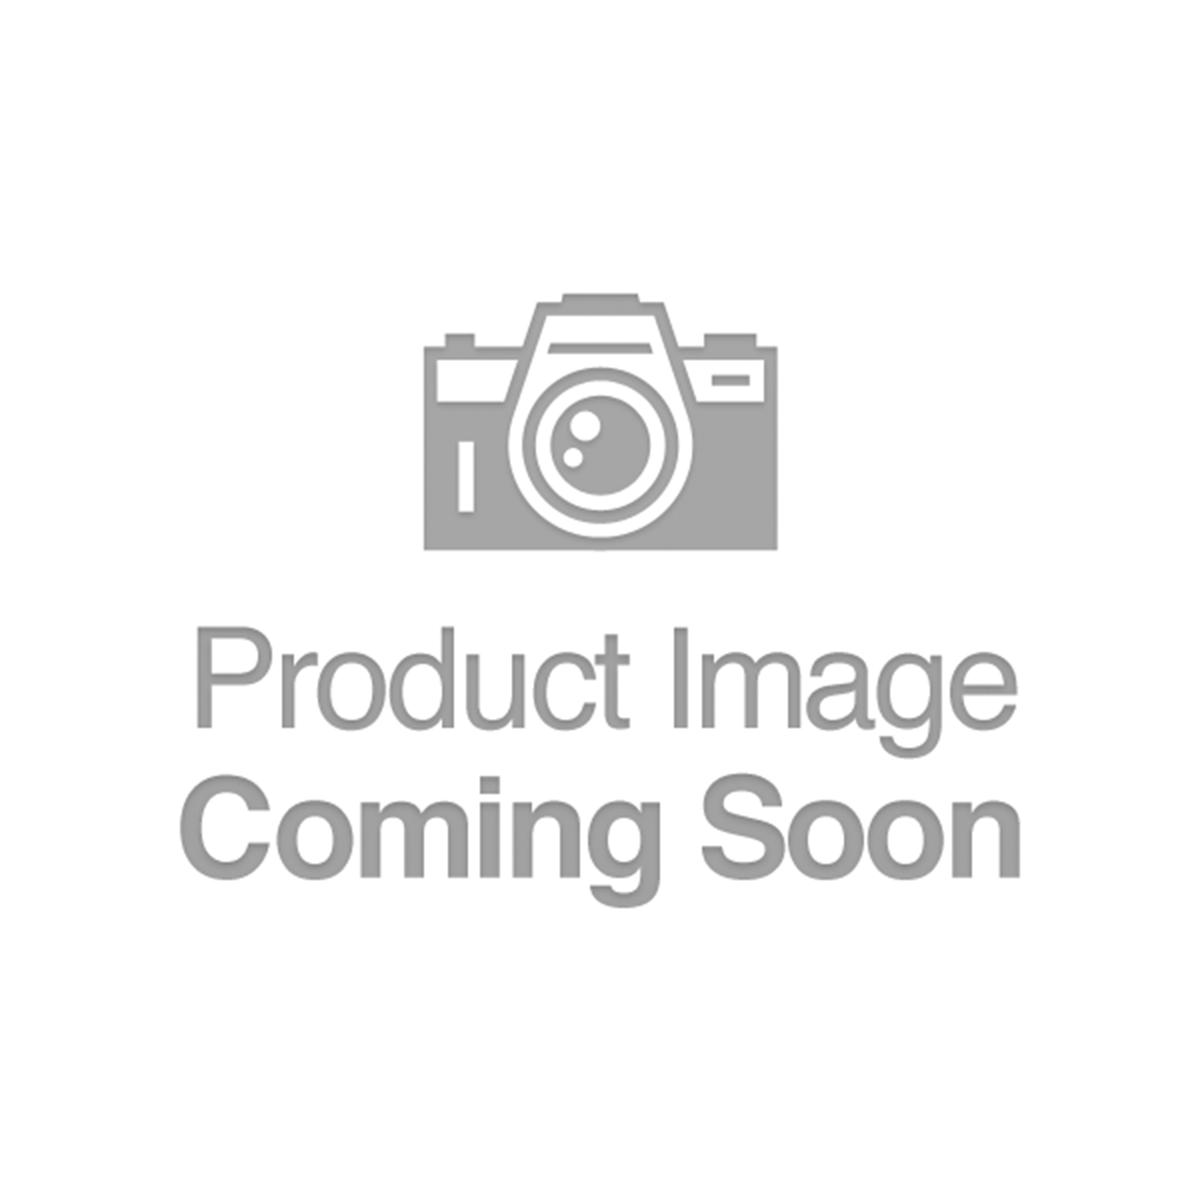 Miller - South Dakota - CH 6789 - FR 624 - PMG 20